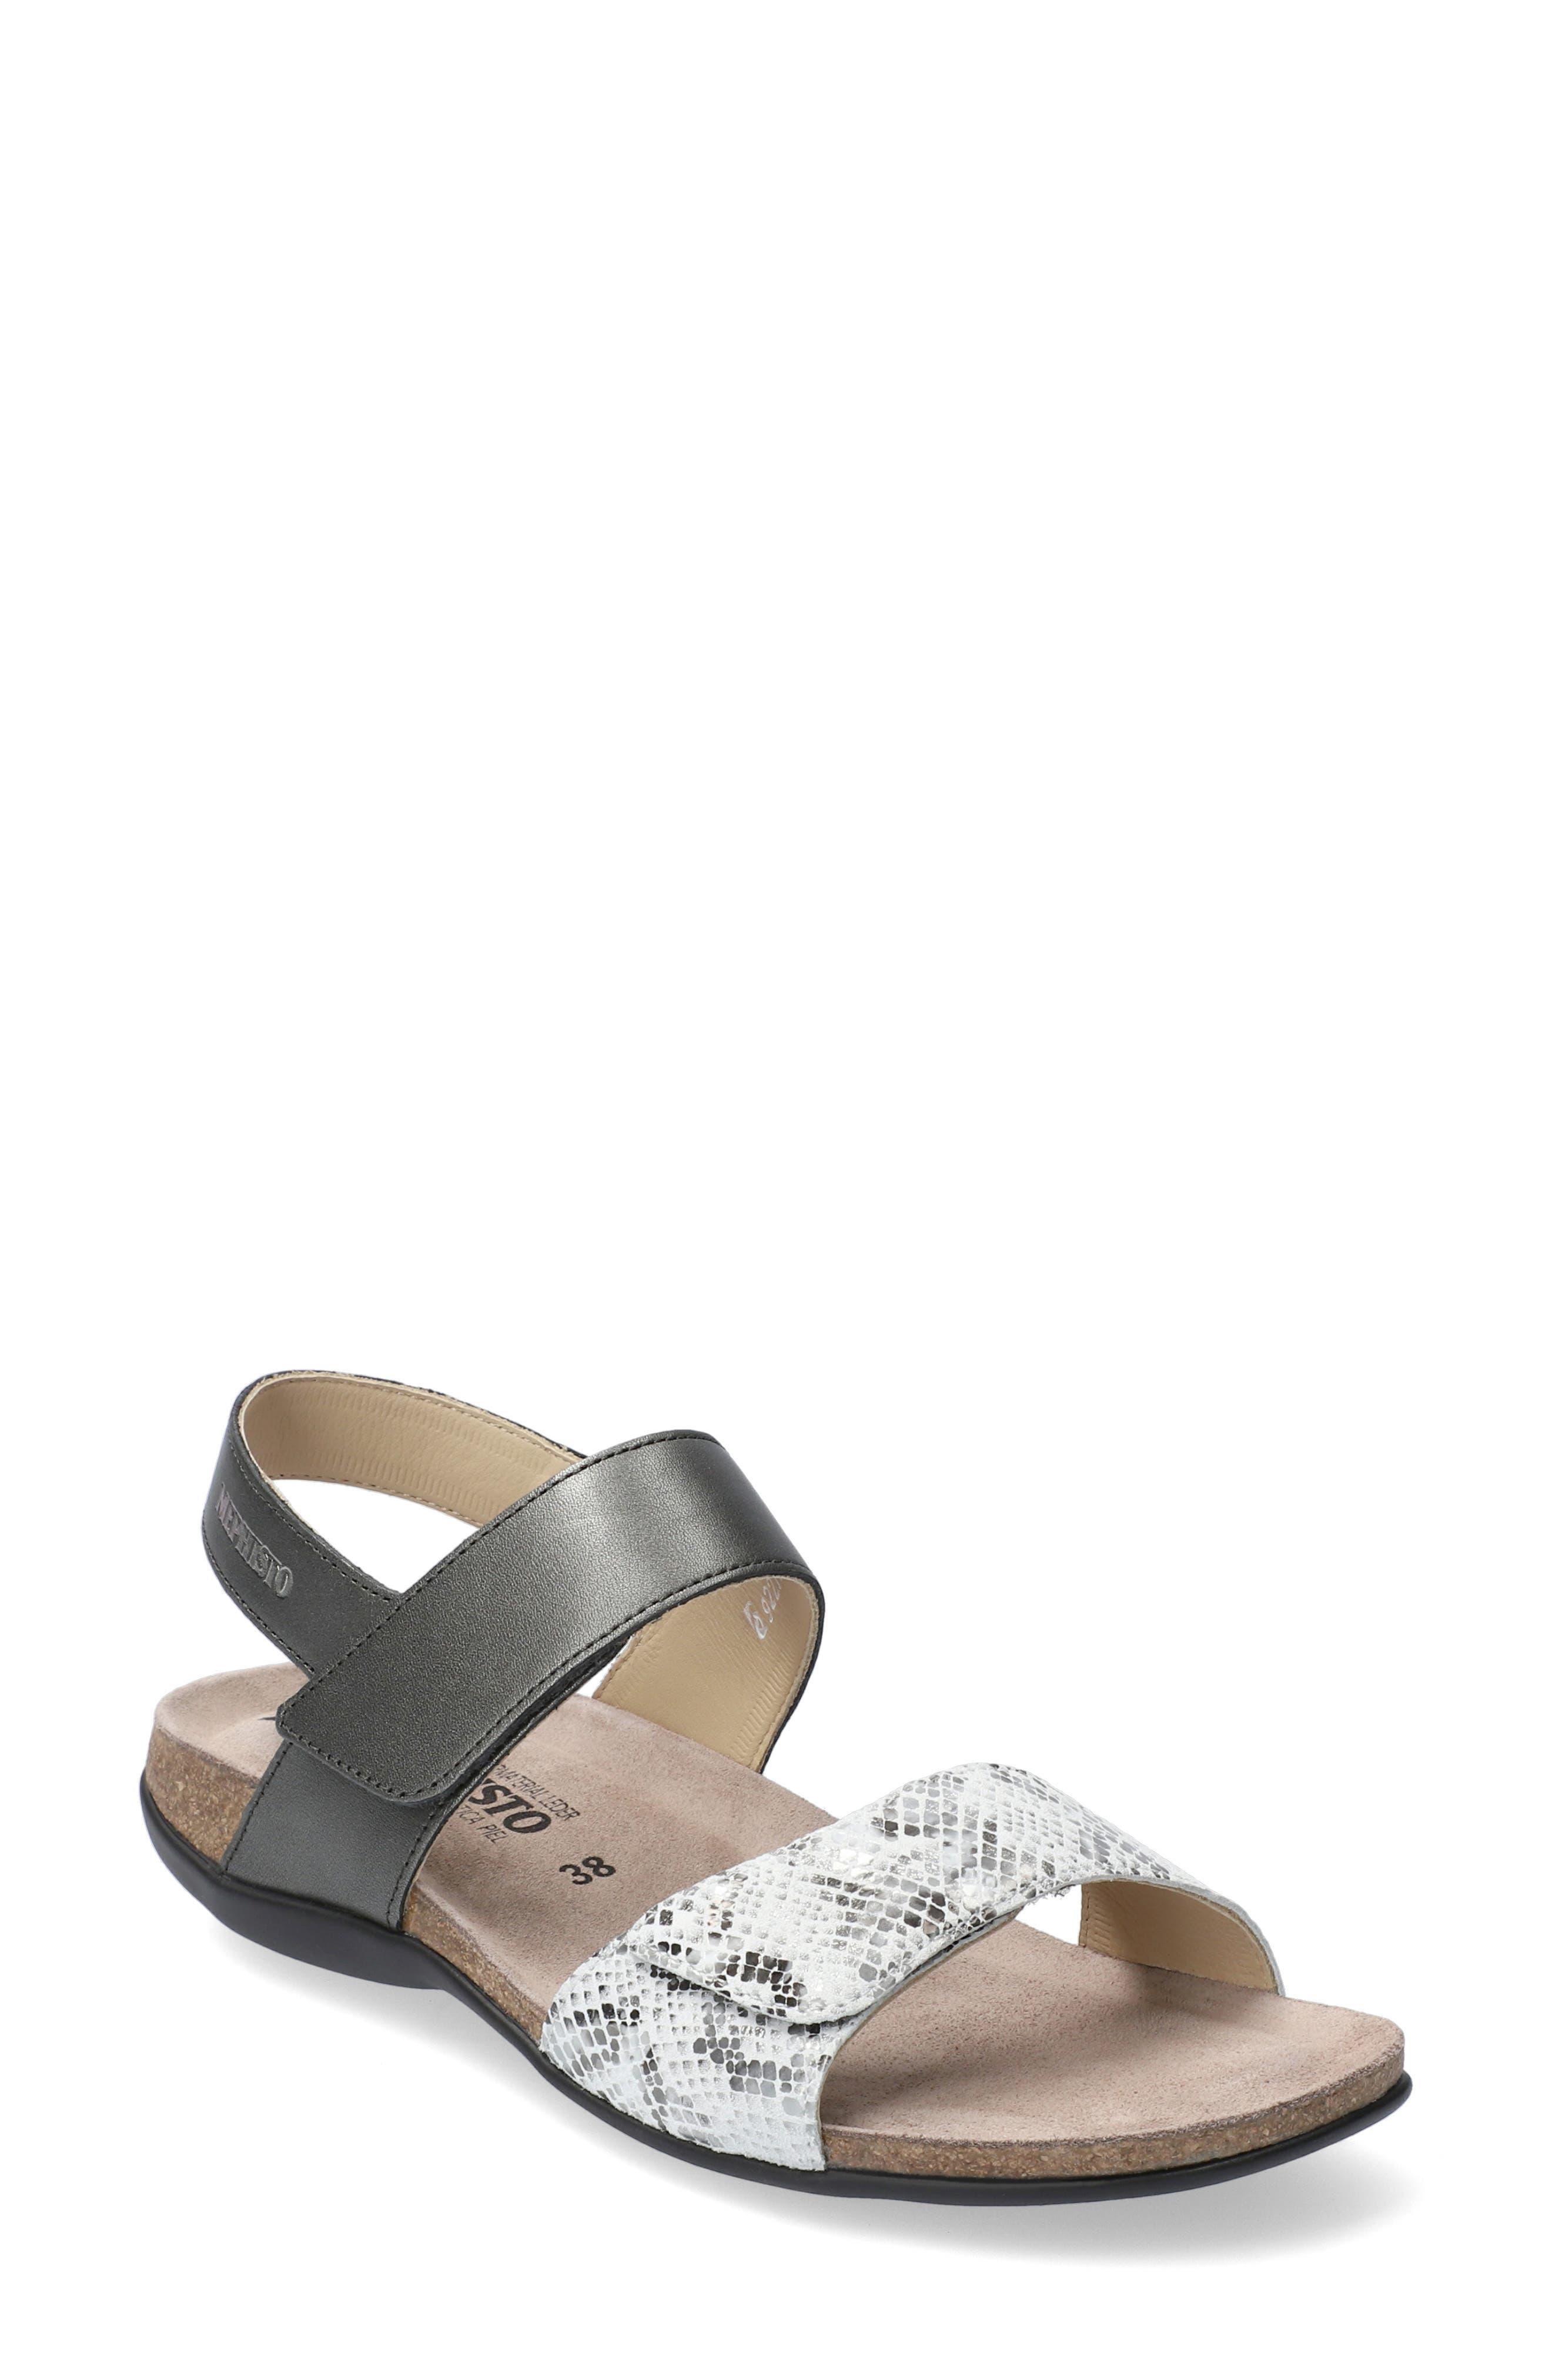 'Agave' Sandal